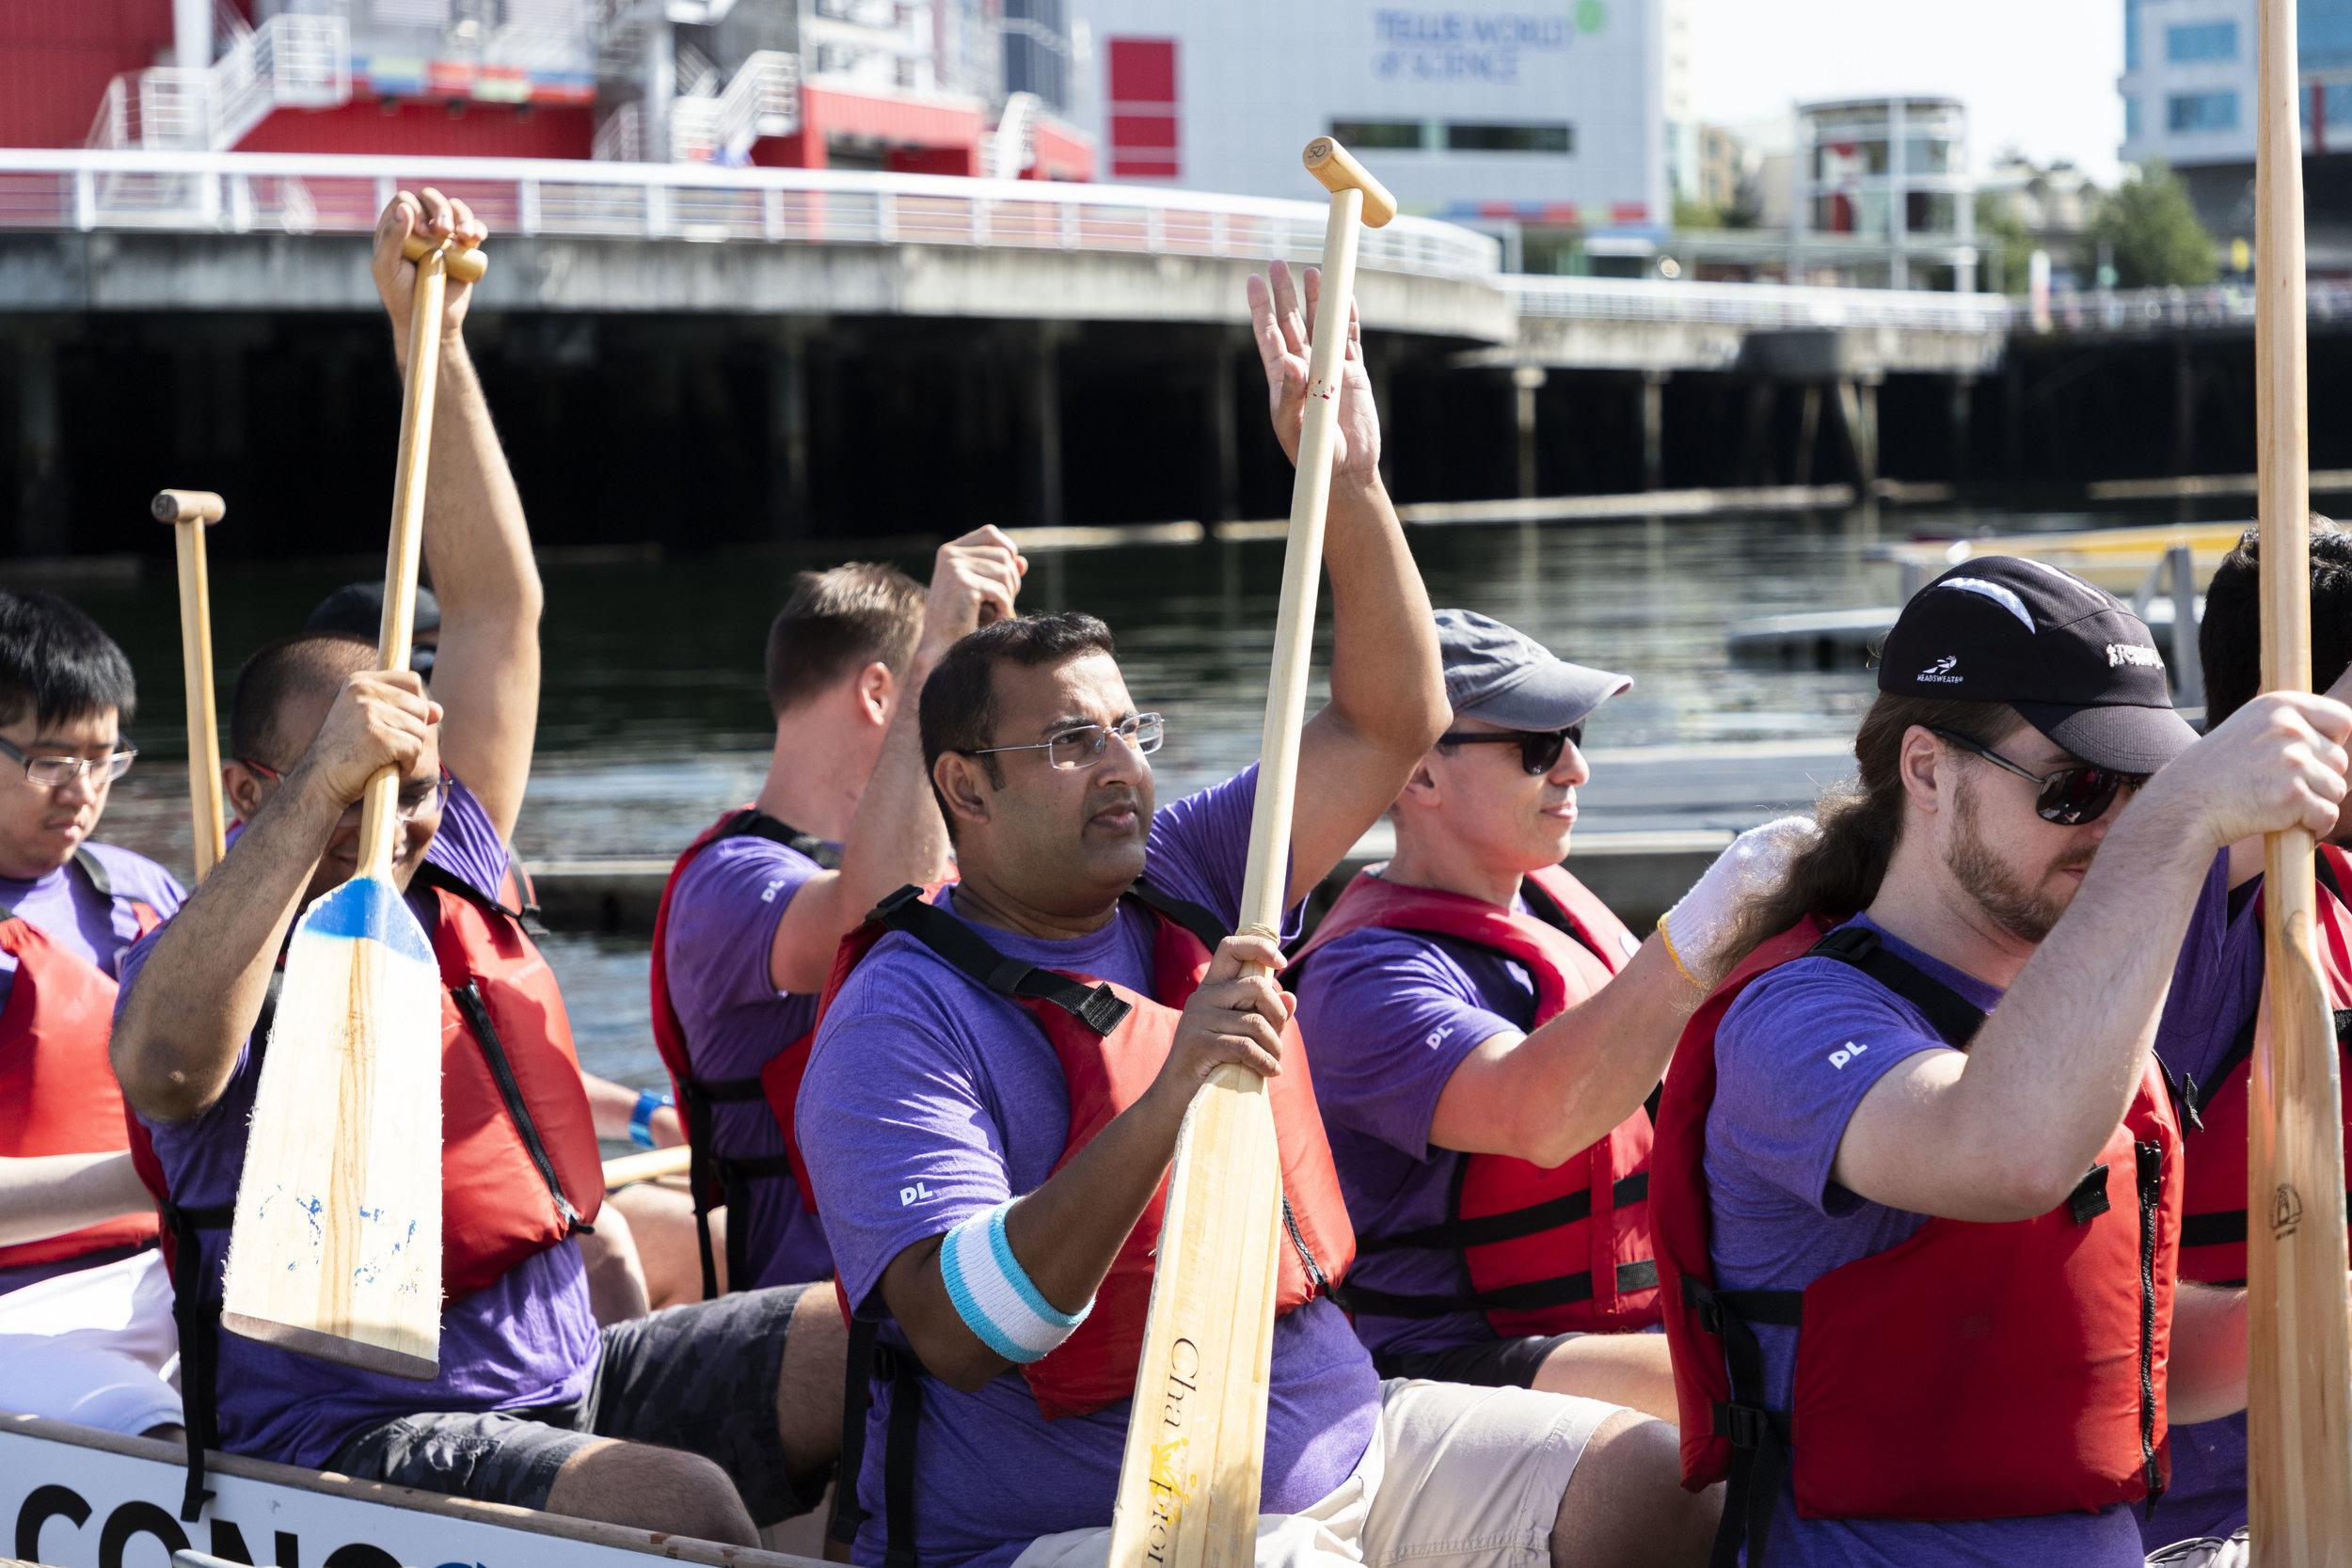 The Purple team's dragon boating crew display David Lim's impact.